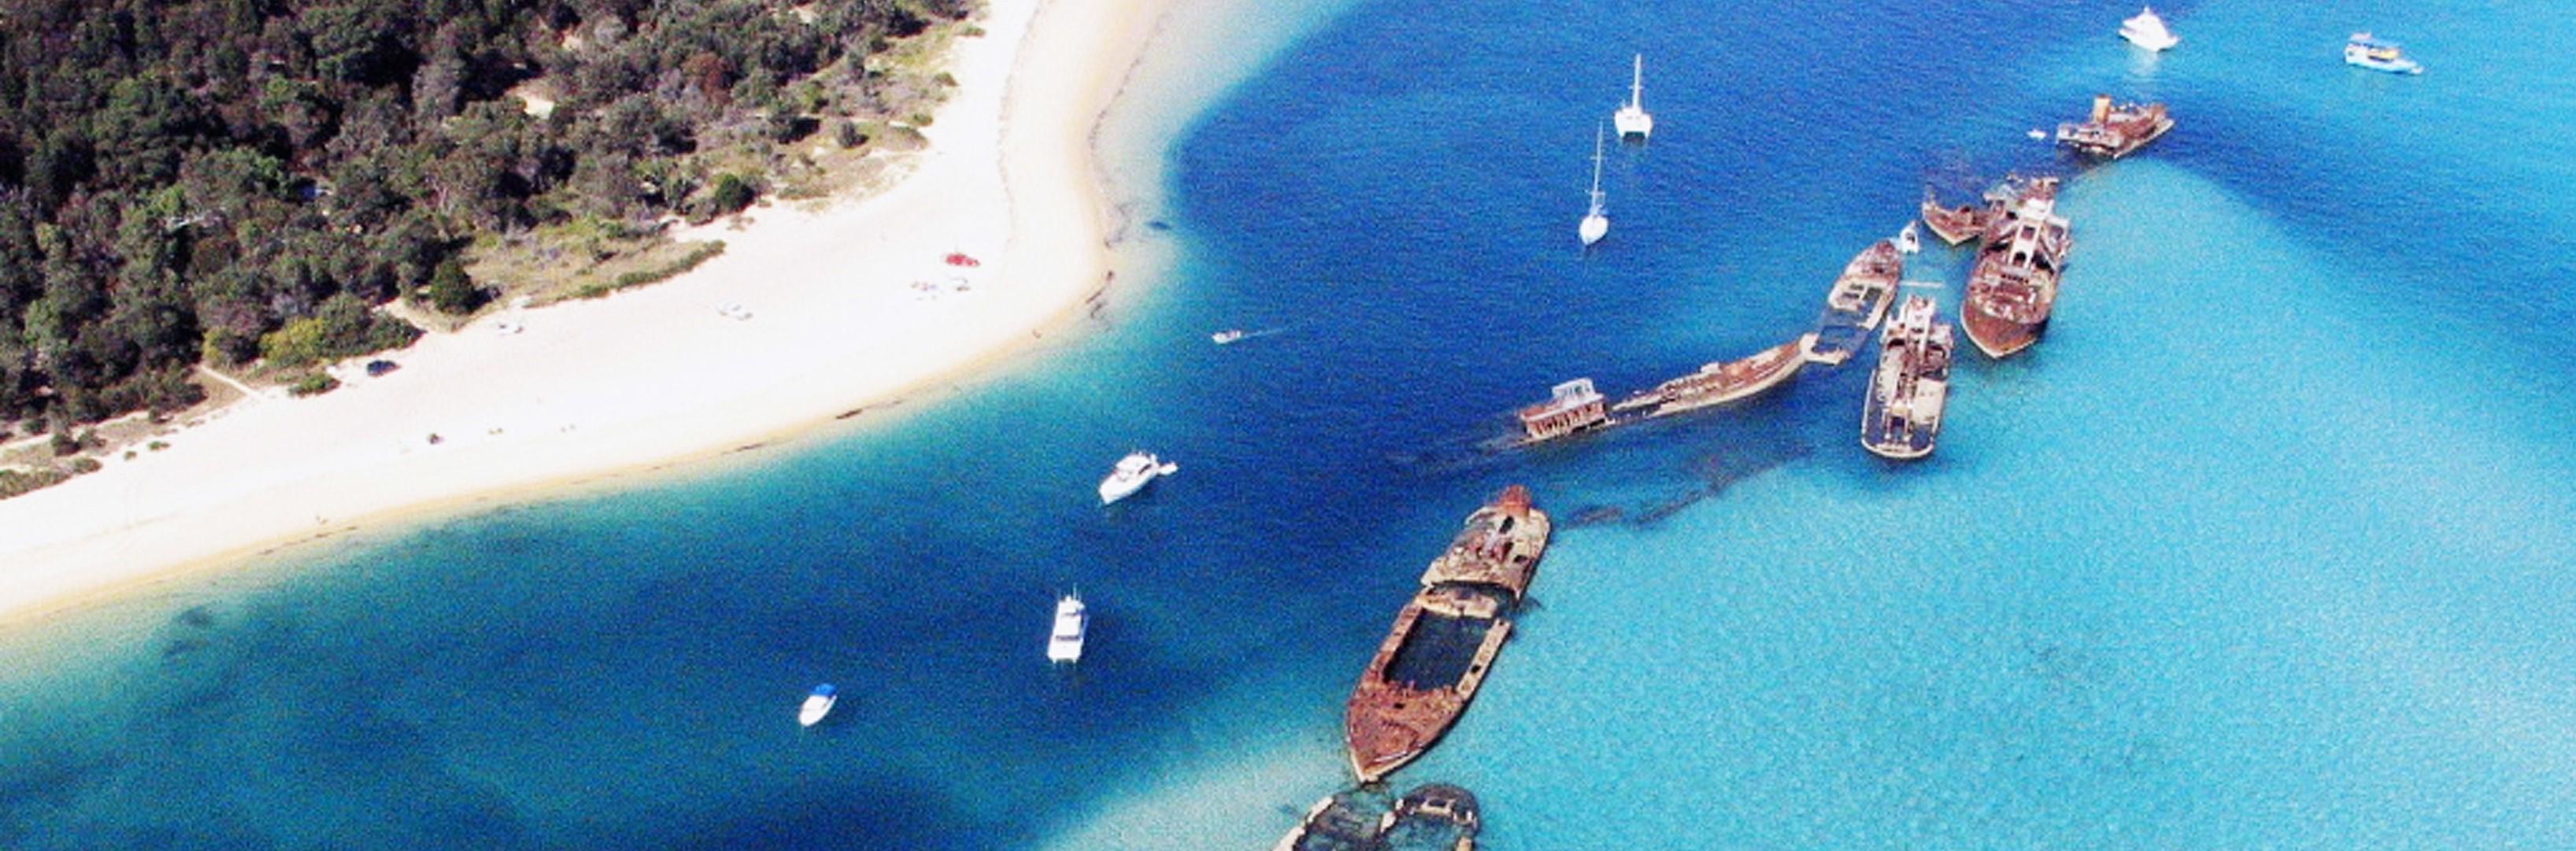 Wrecks Ariel Photo of Tangalooma Island